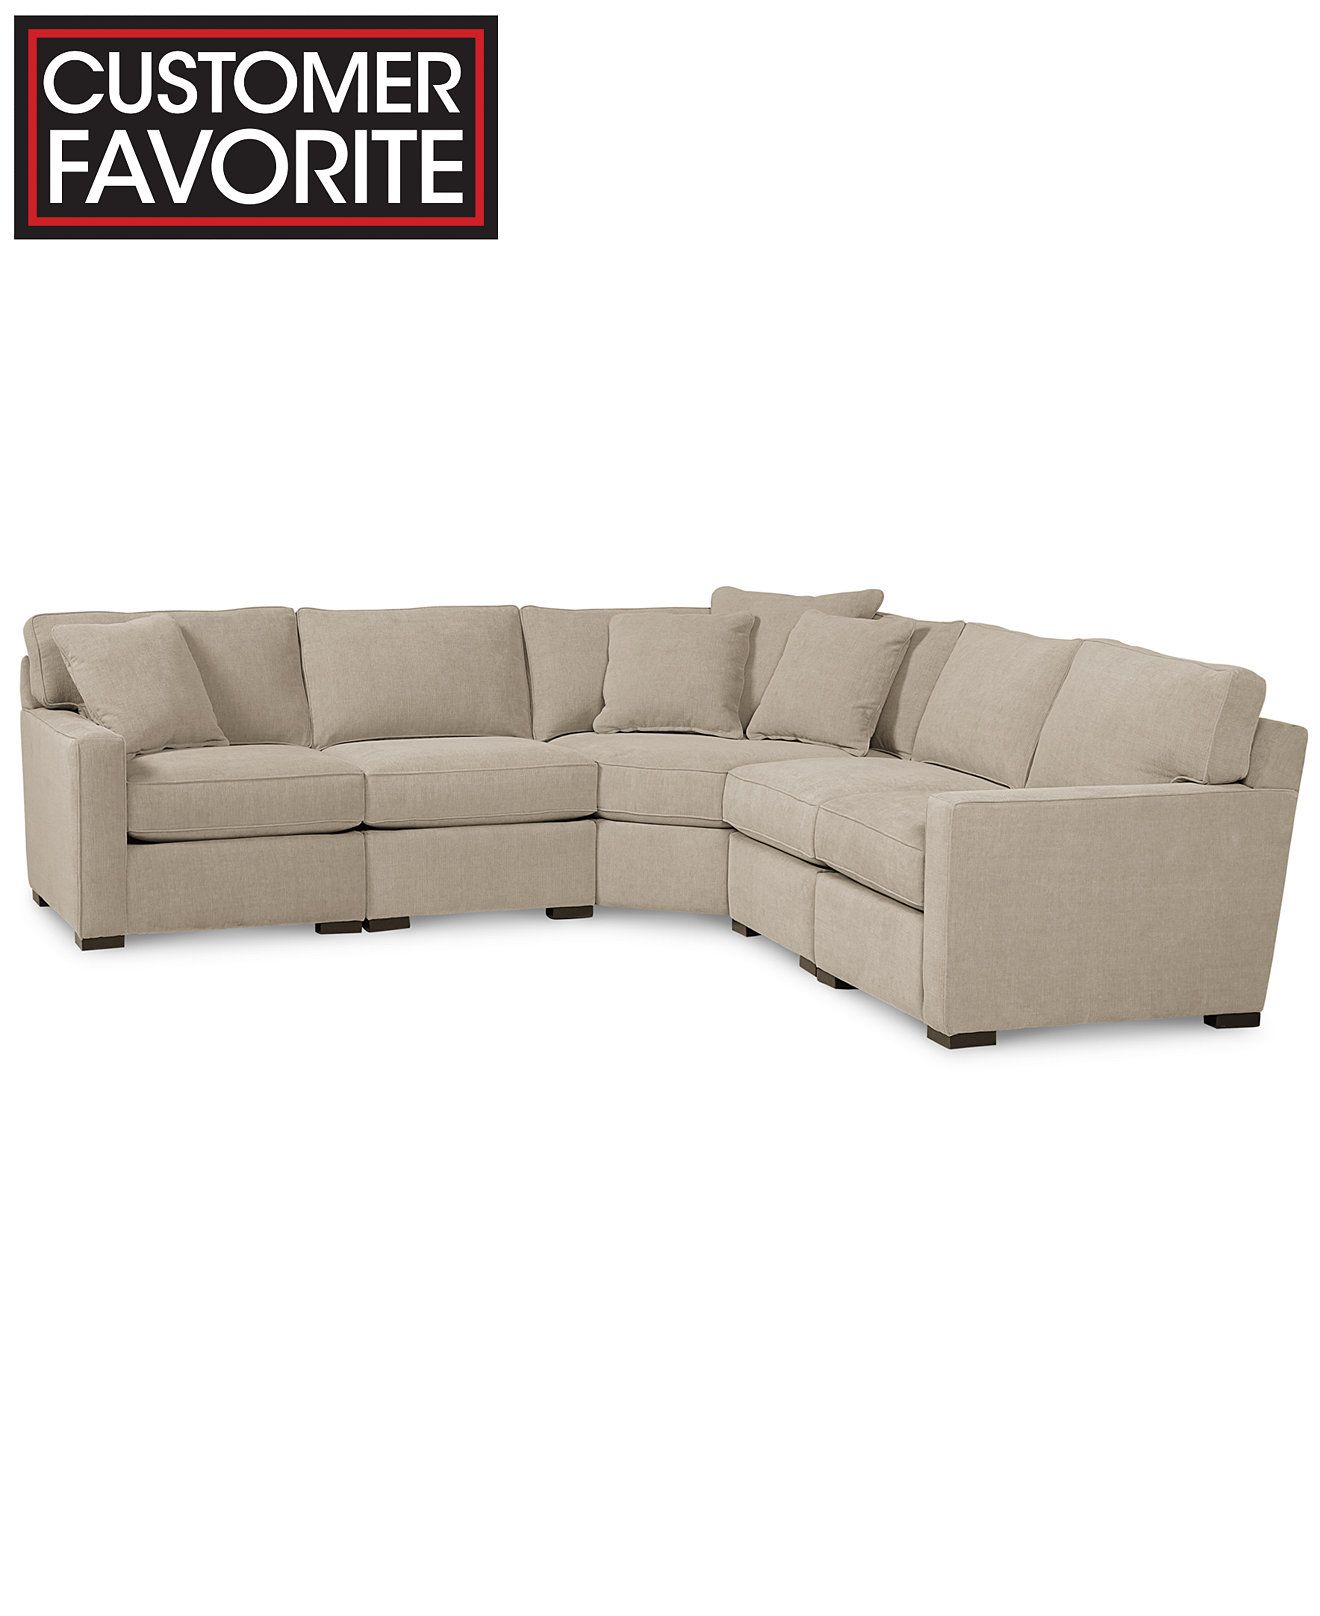 Radley Fabric 5 Piece Sectional Sofa Created For Macy S